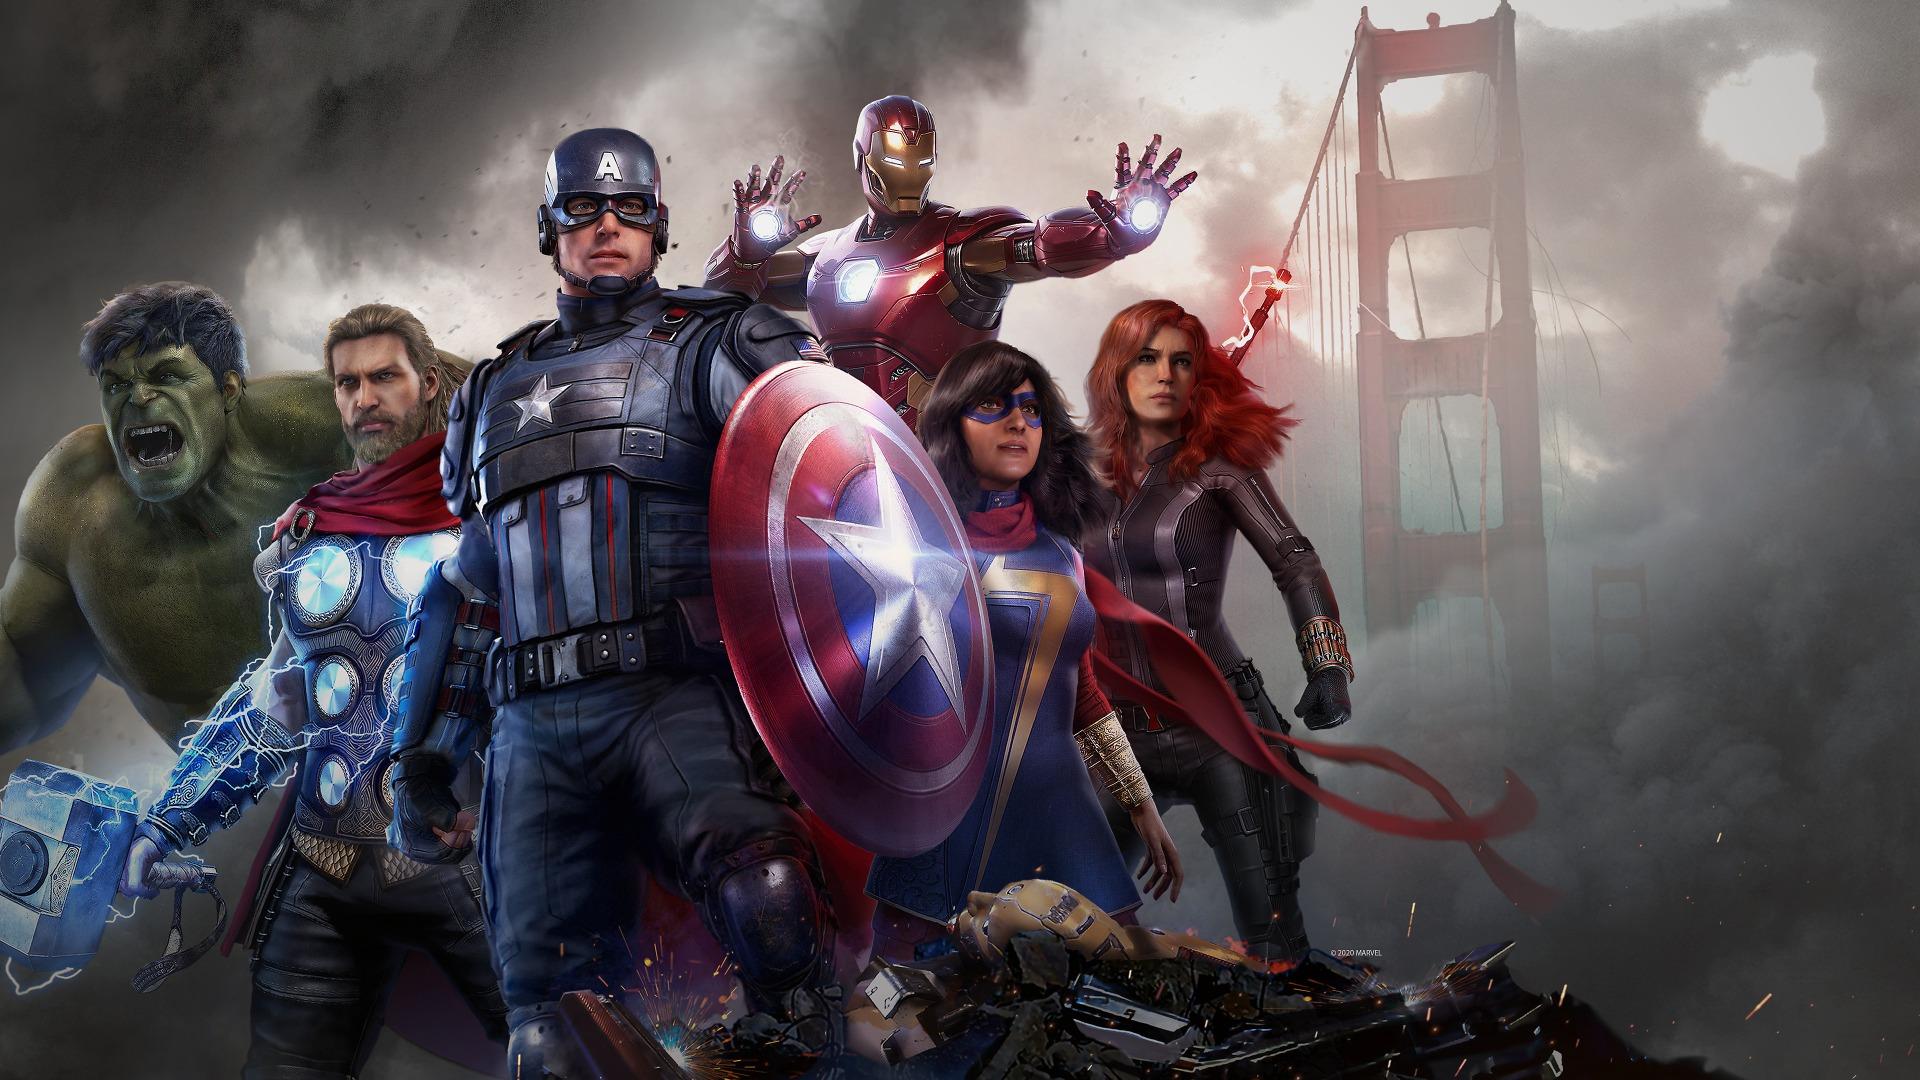 marvels-avengers-background-01-ps4-24jan19-en-us